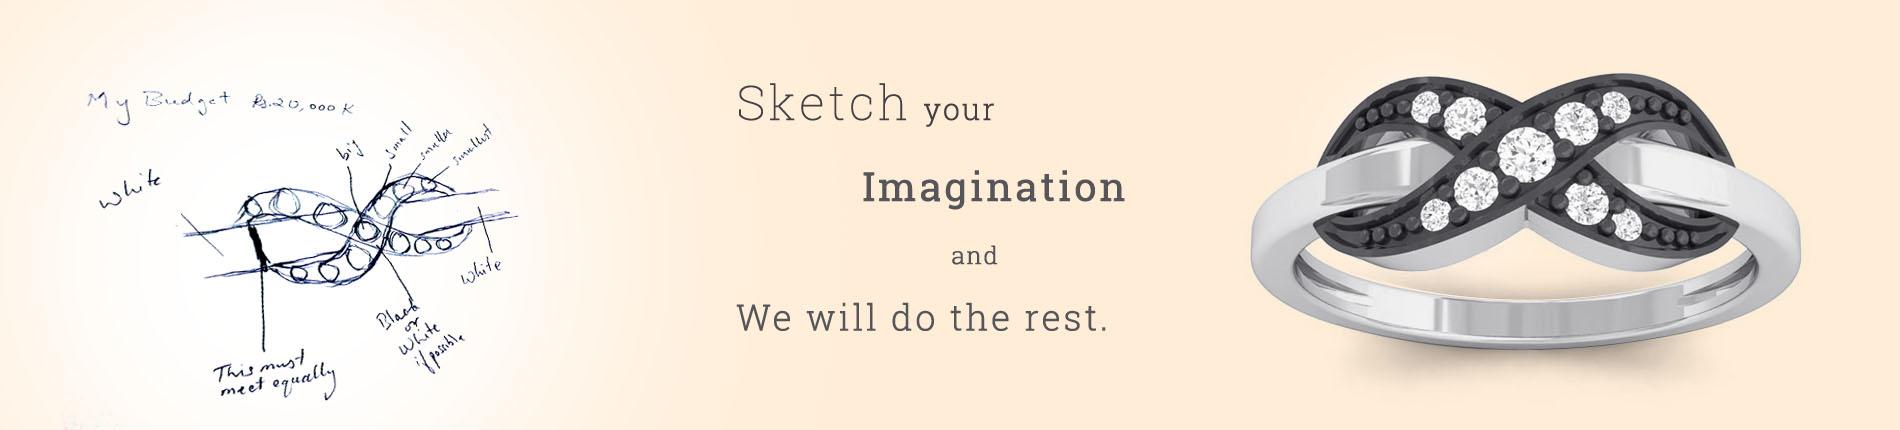 Kreeli Sketch Your Imagination